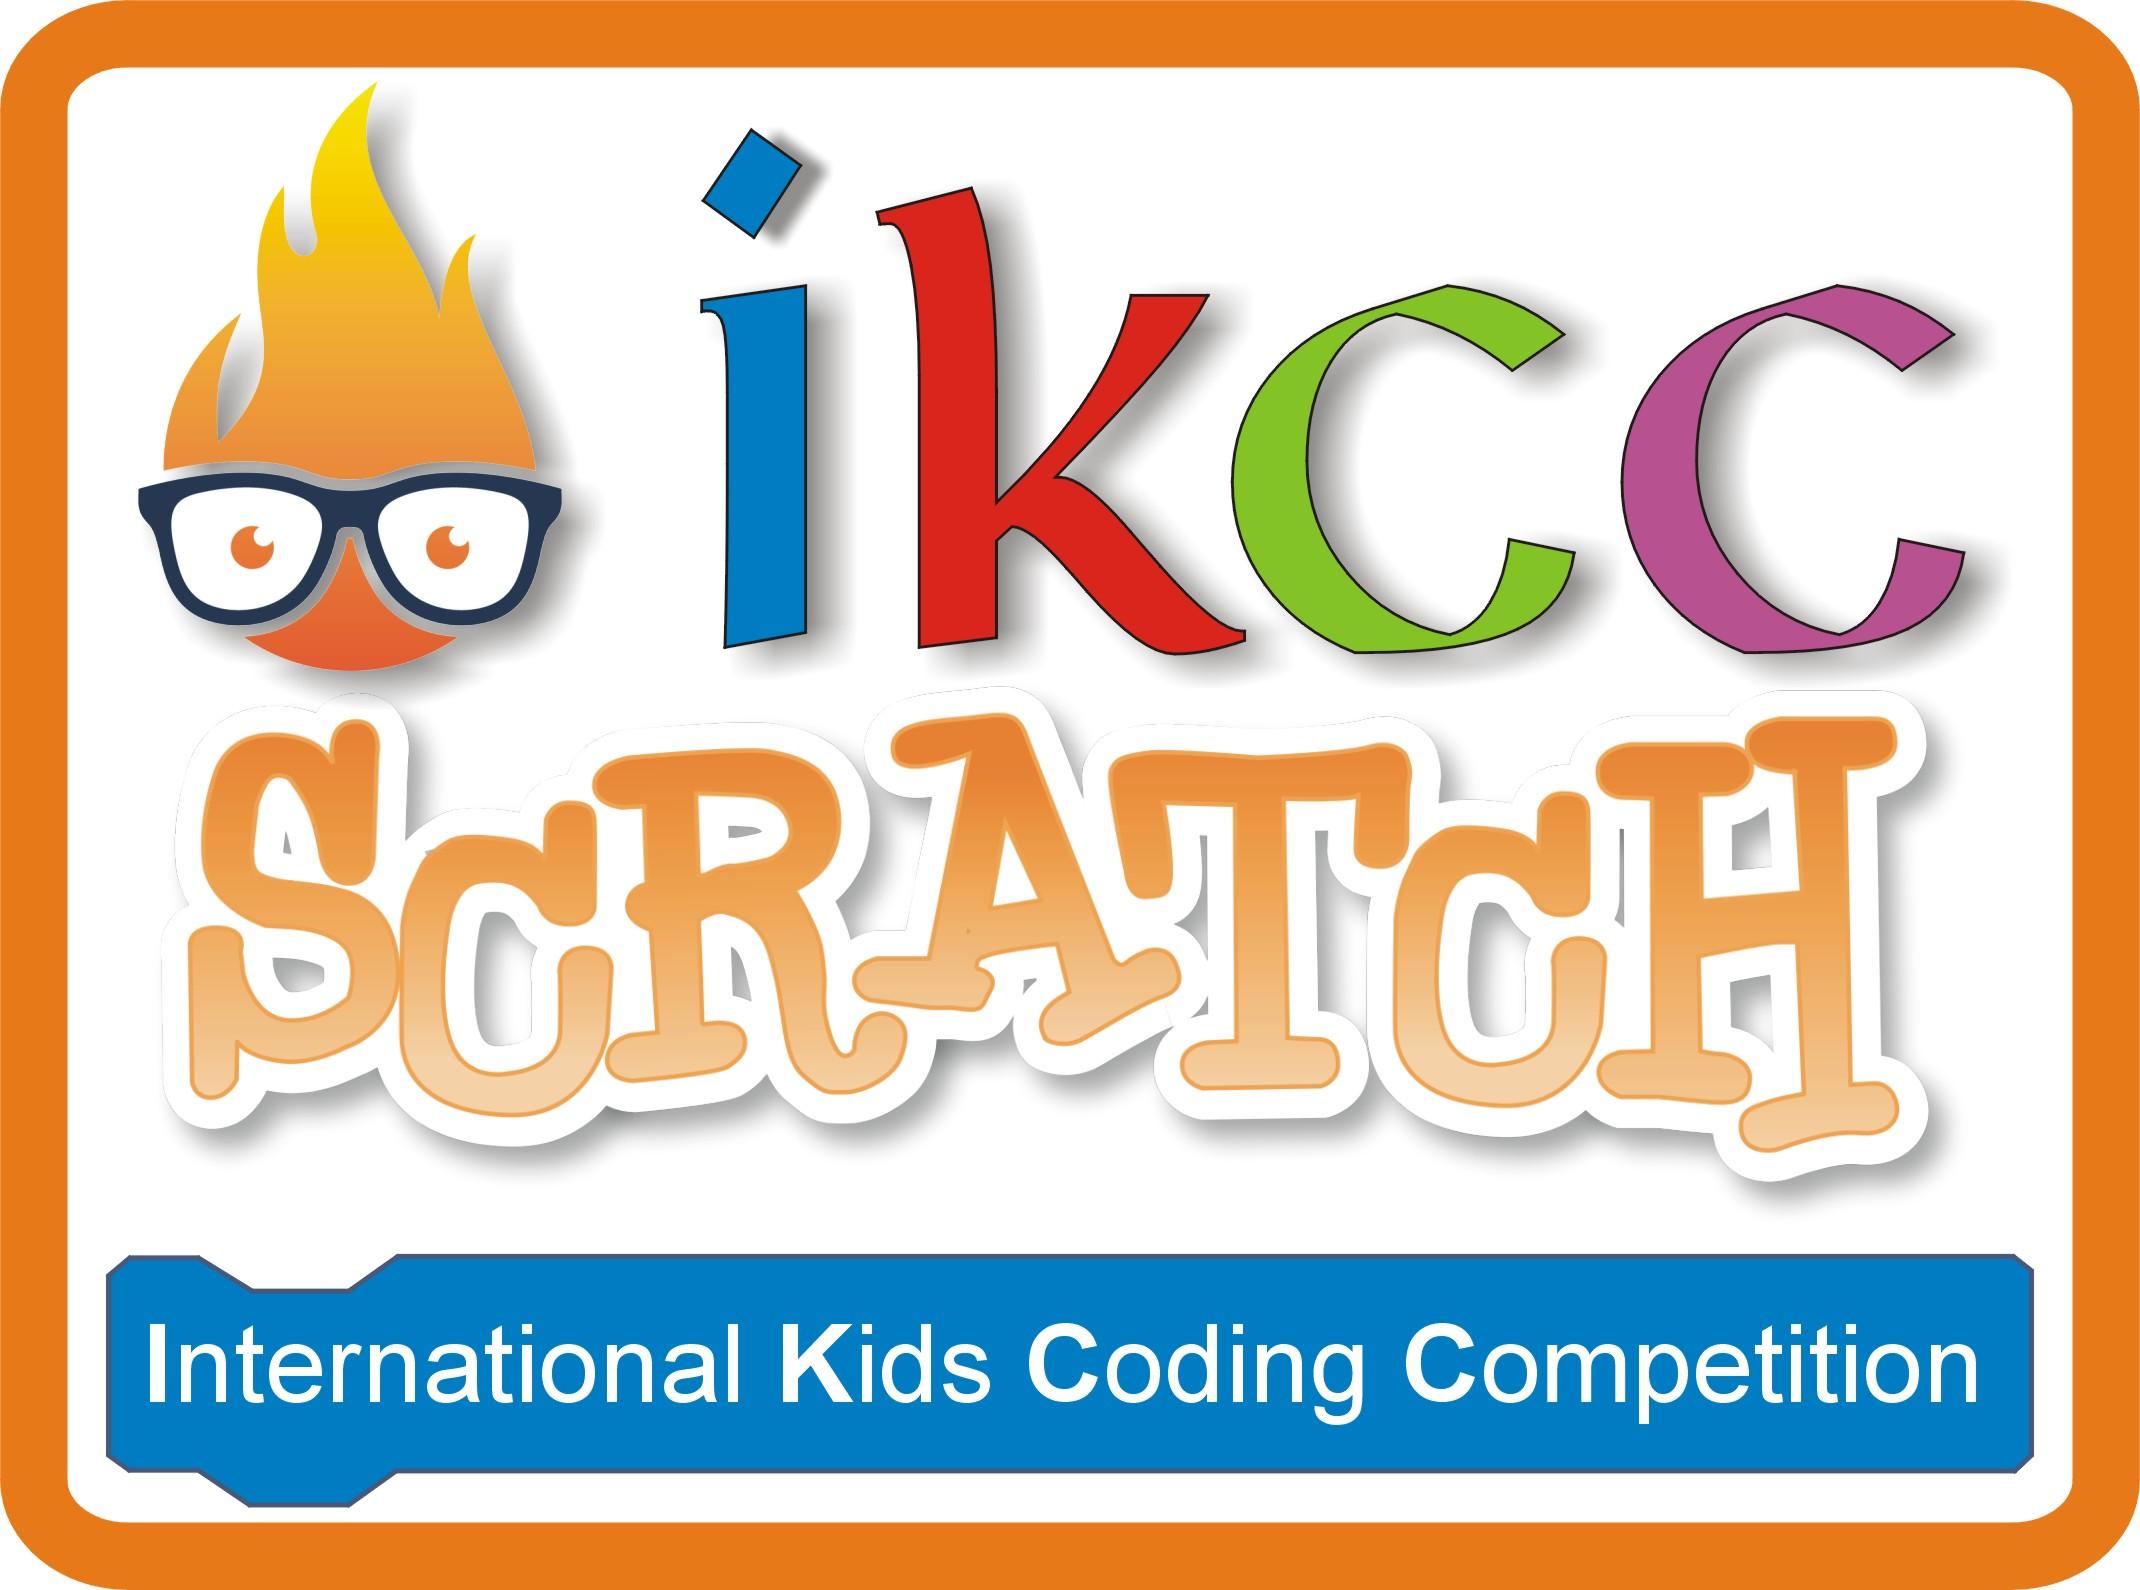 IKCC - International Kids Coding Competition